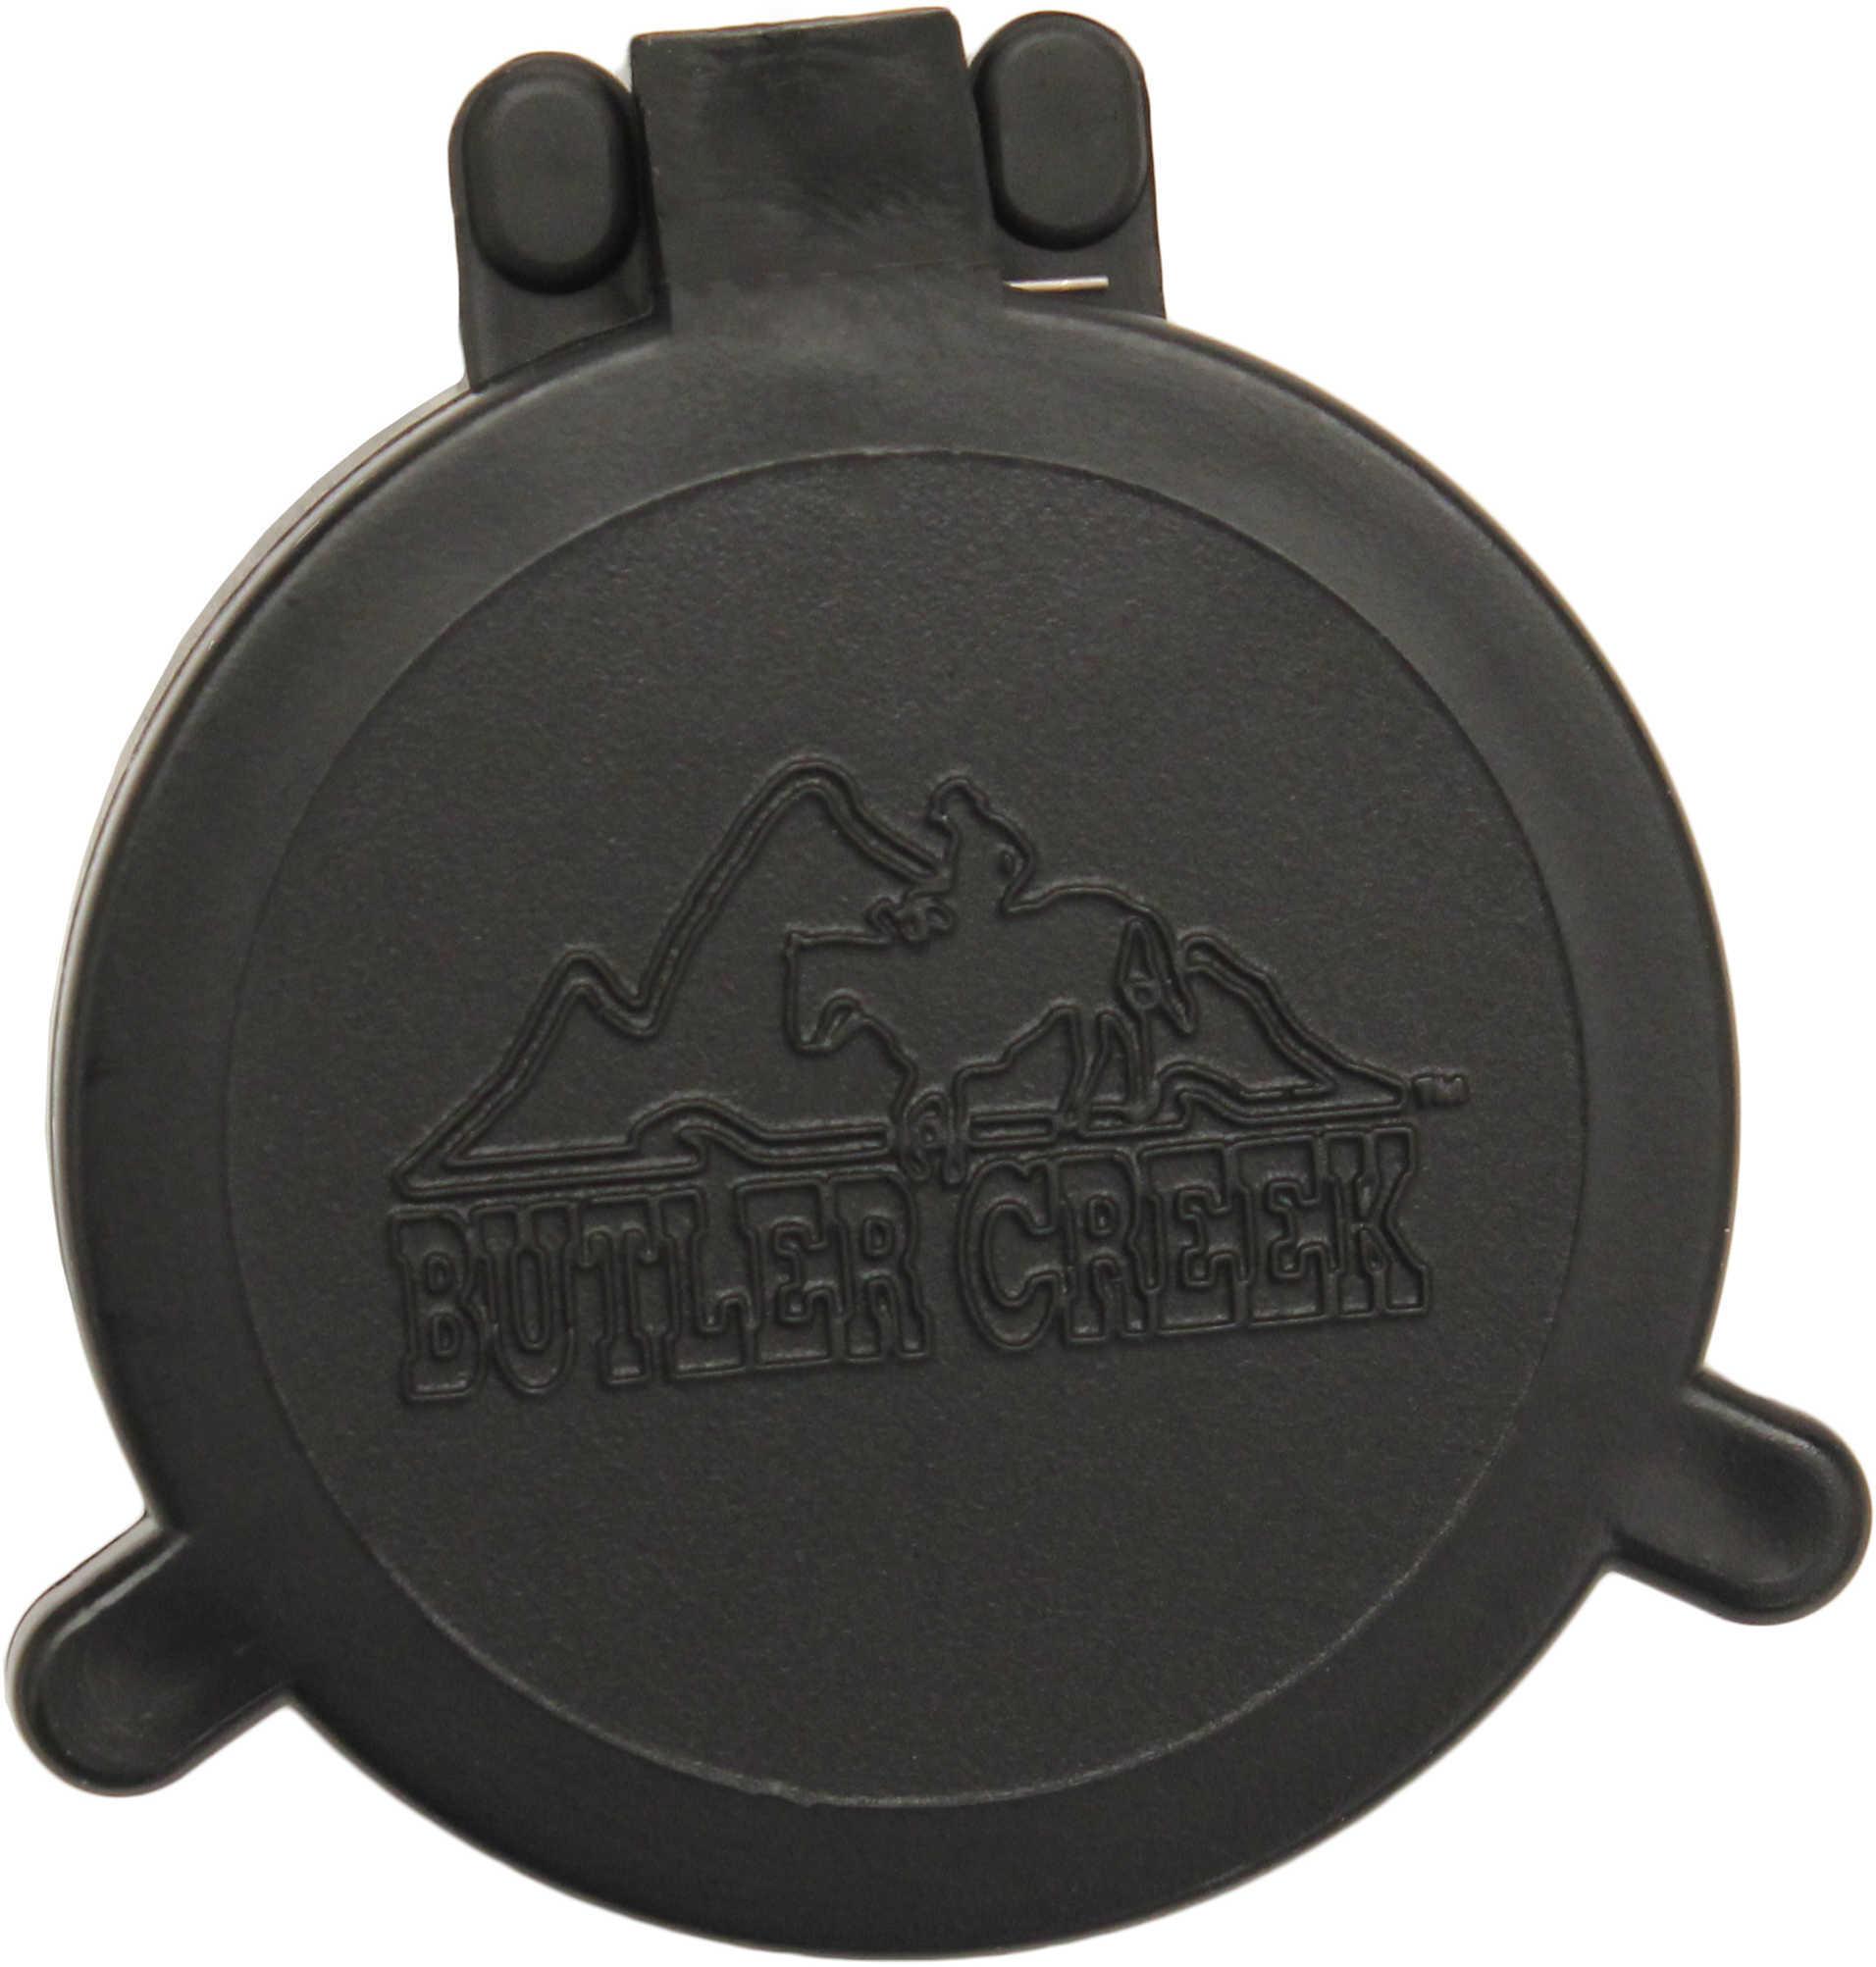 Butler Creek Flip Open Scope Cover - Objective Size 15 Md: 30150